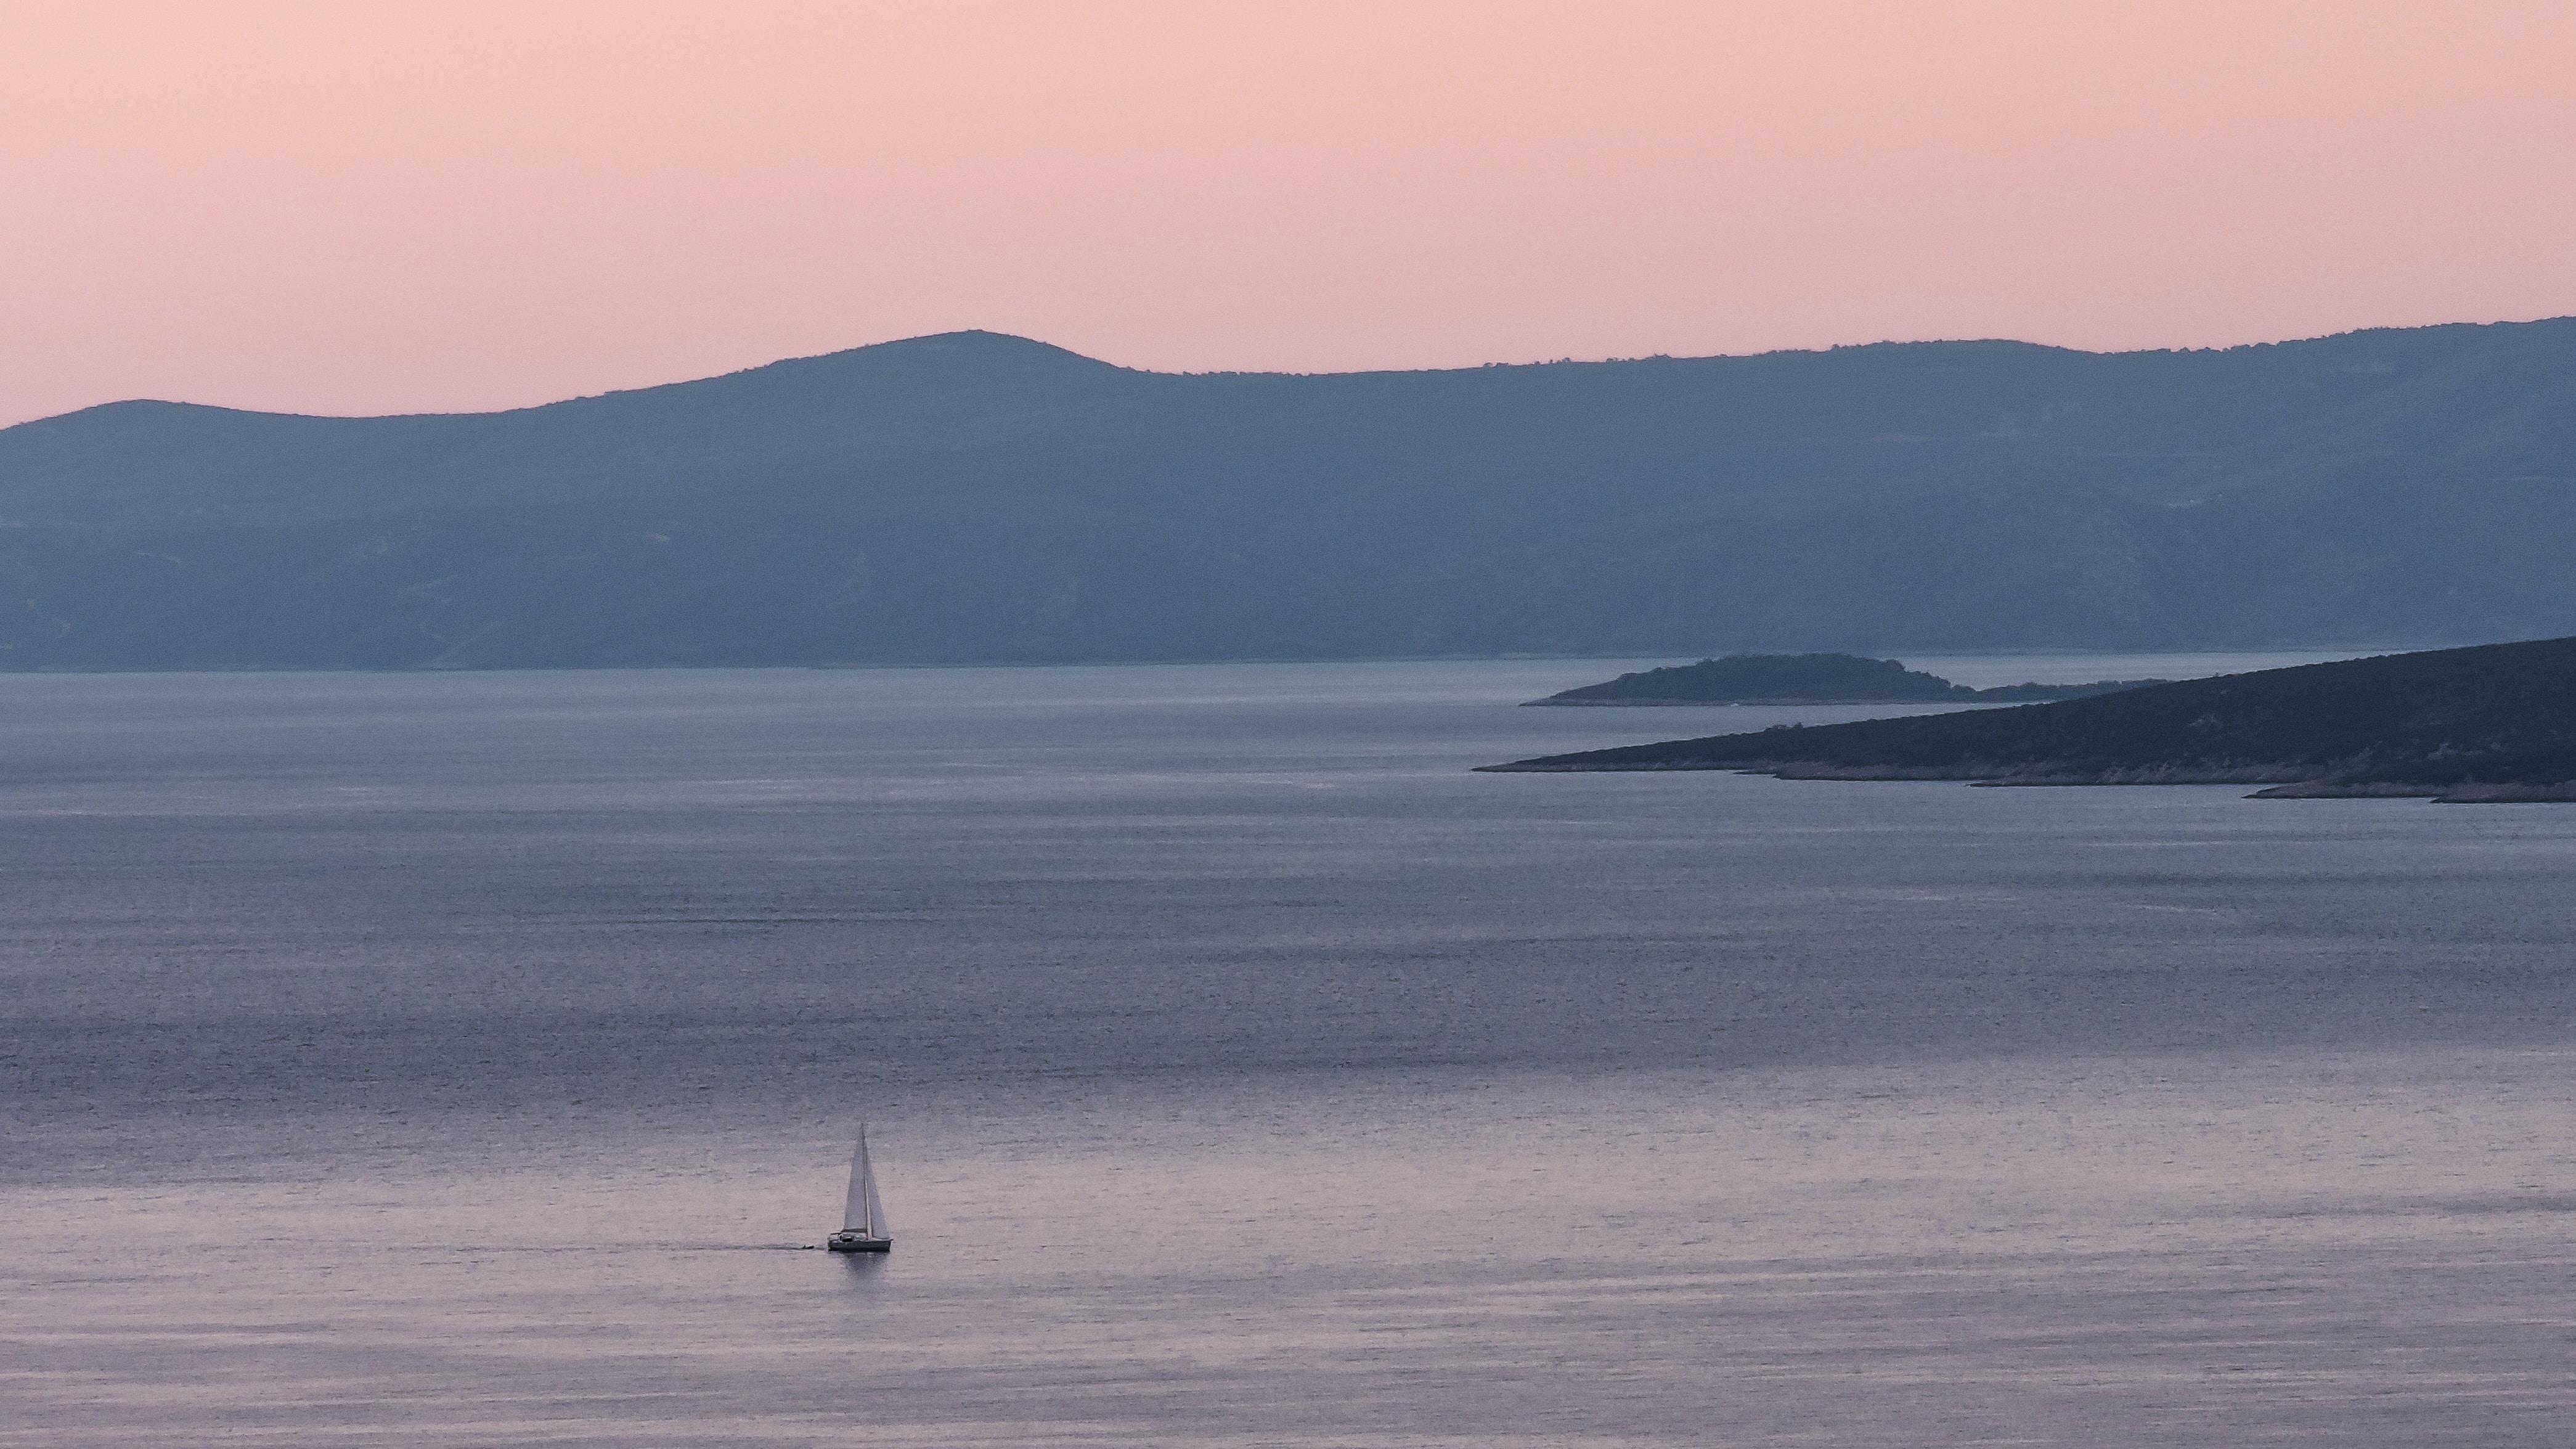 sailing boat on ocean